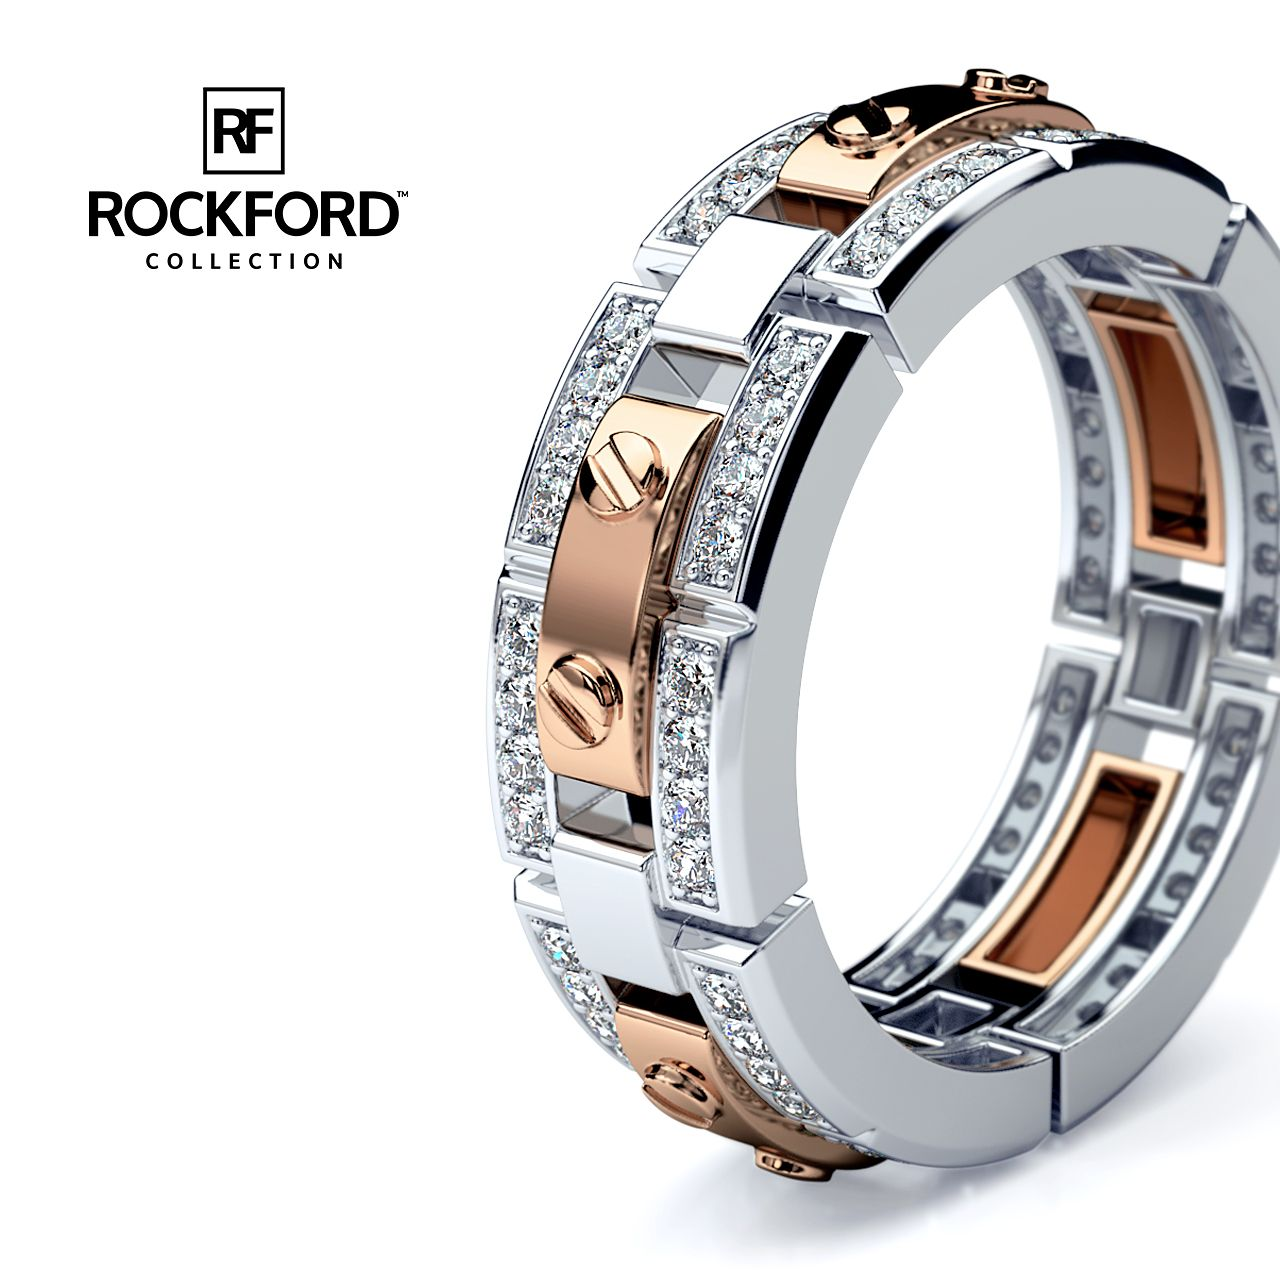 REX Mens TwoTone Gold Wedding Band with Diamonds I ️